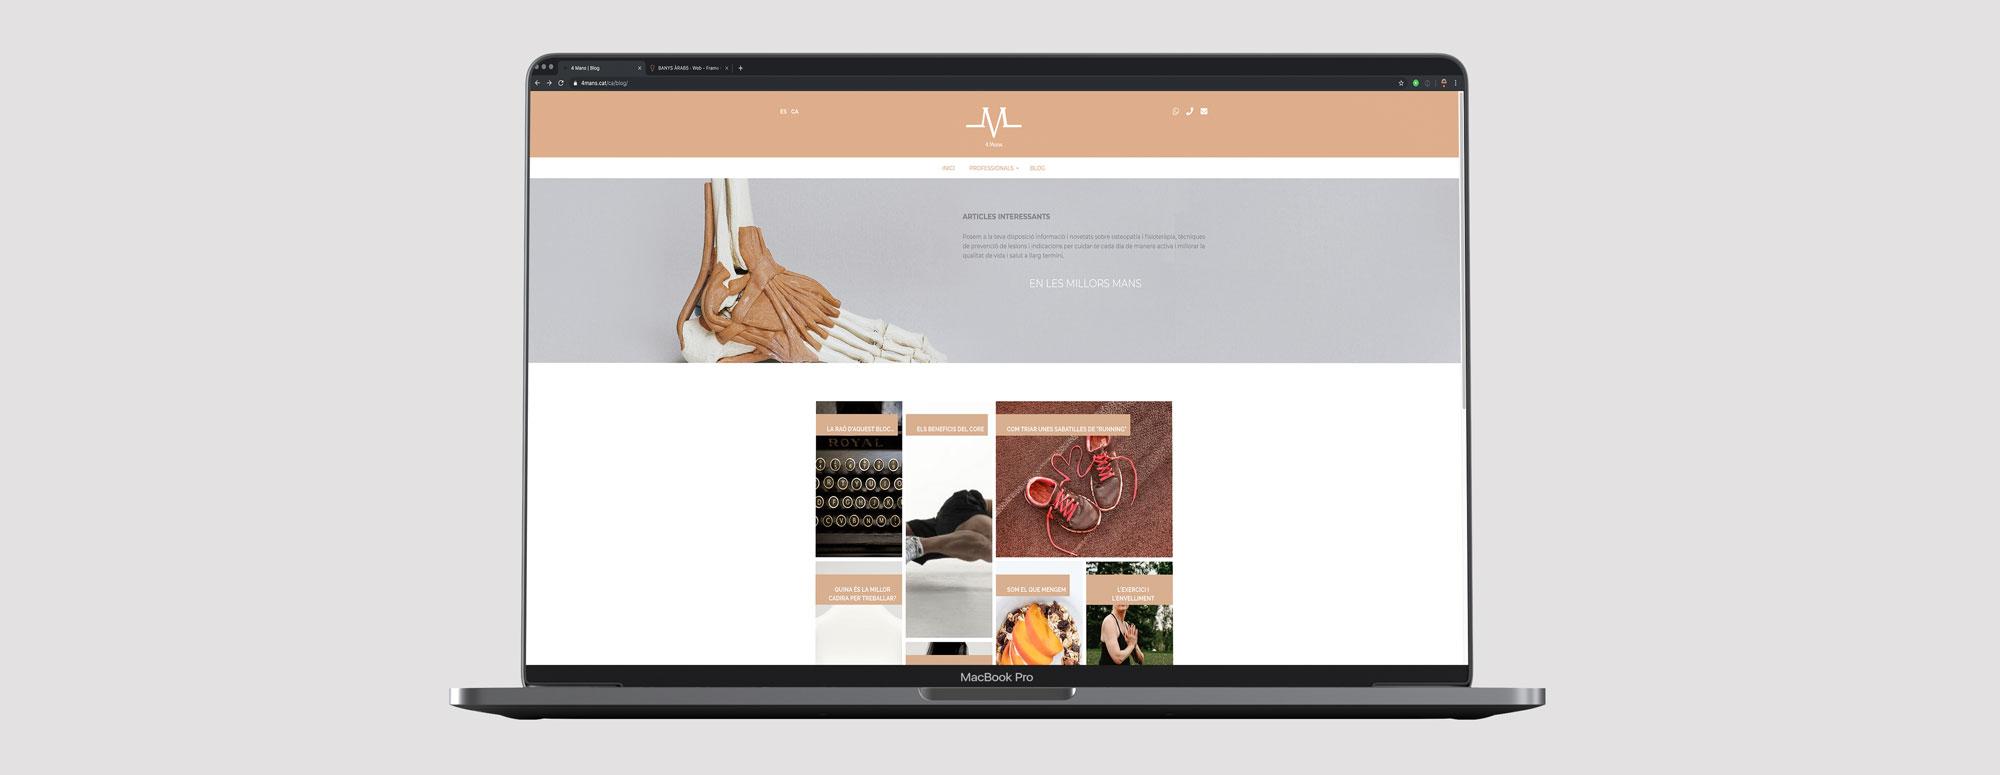 4mans web blog